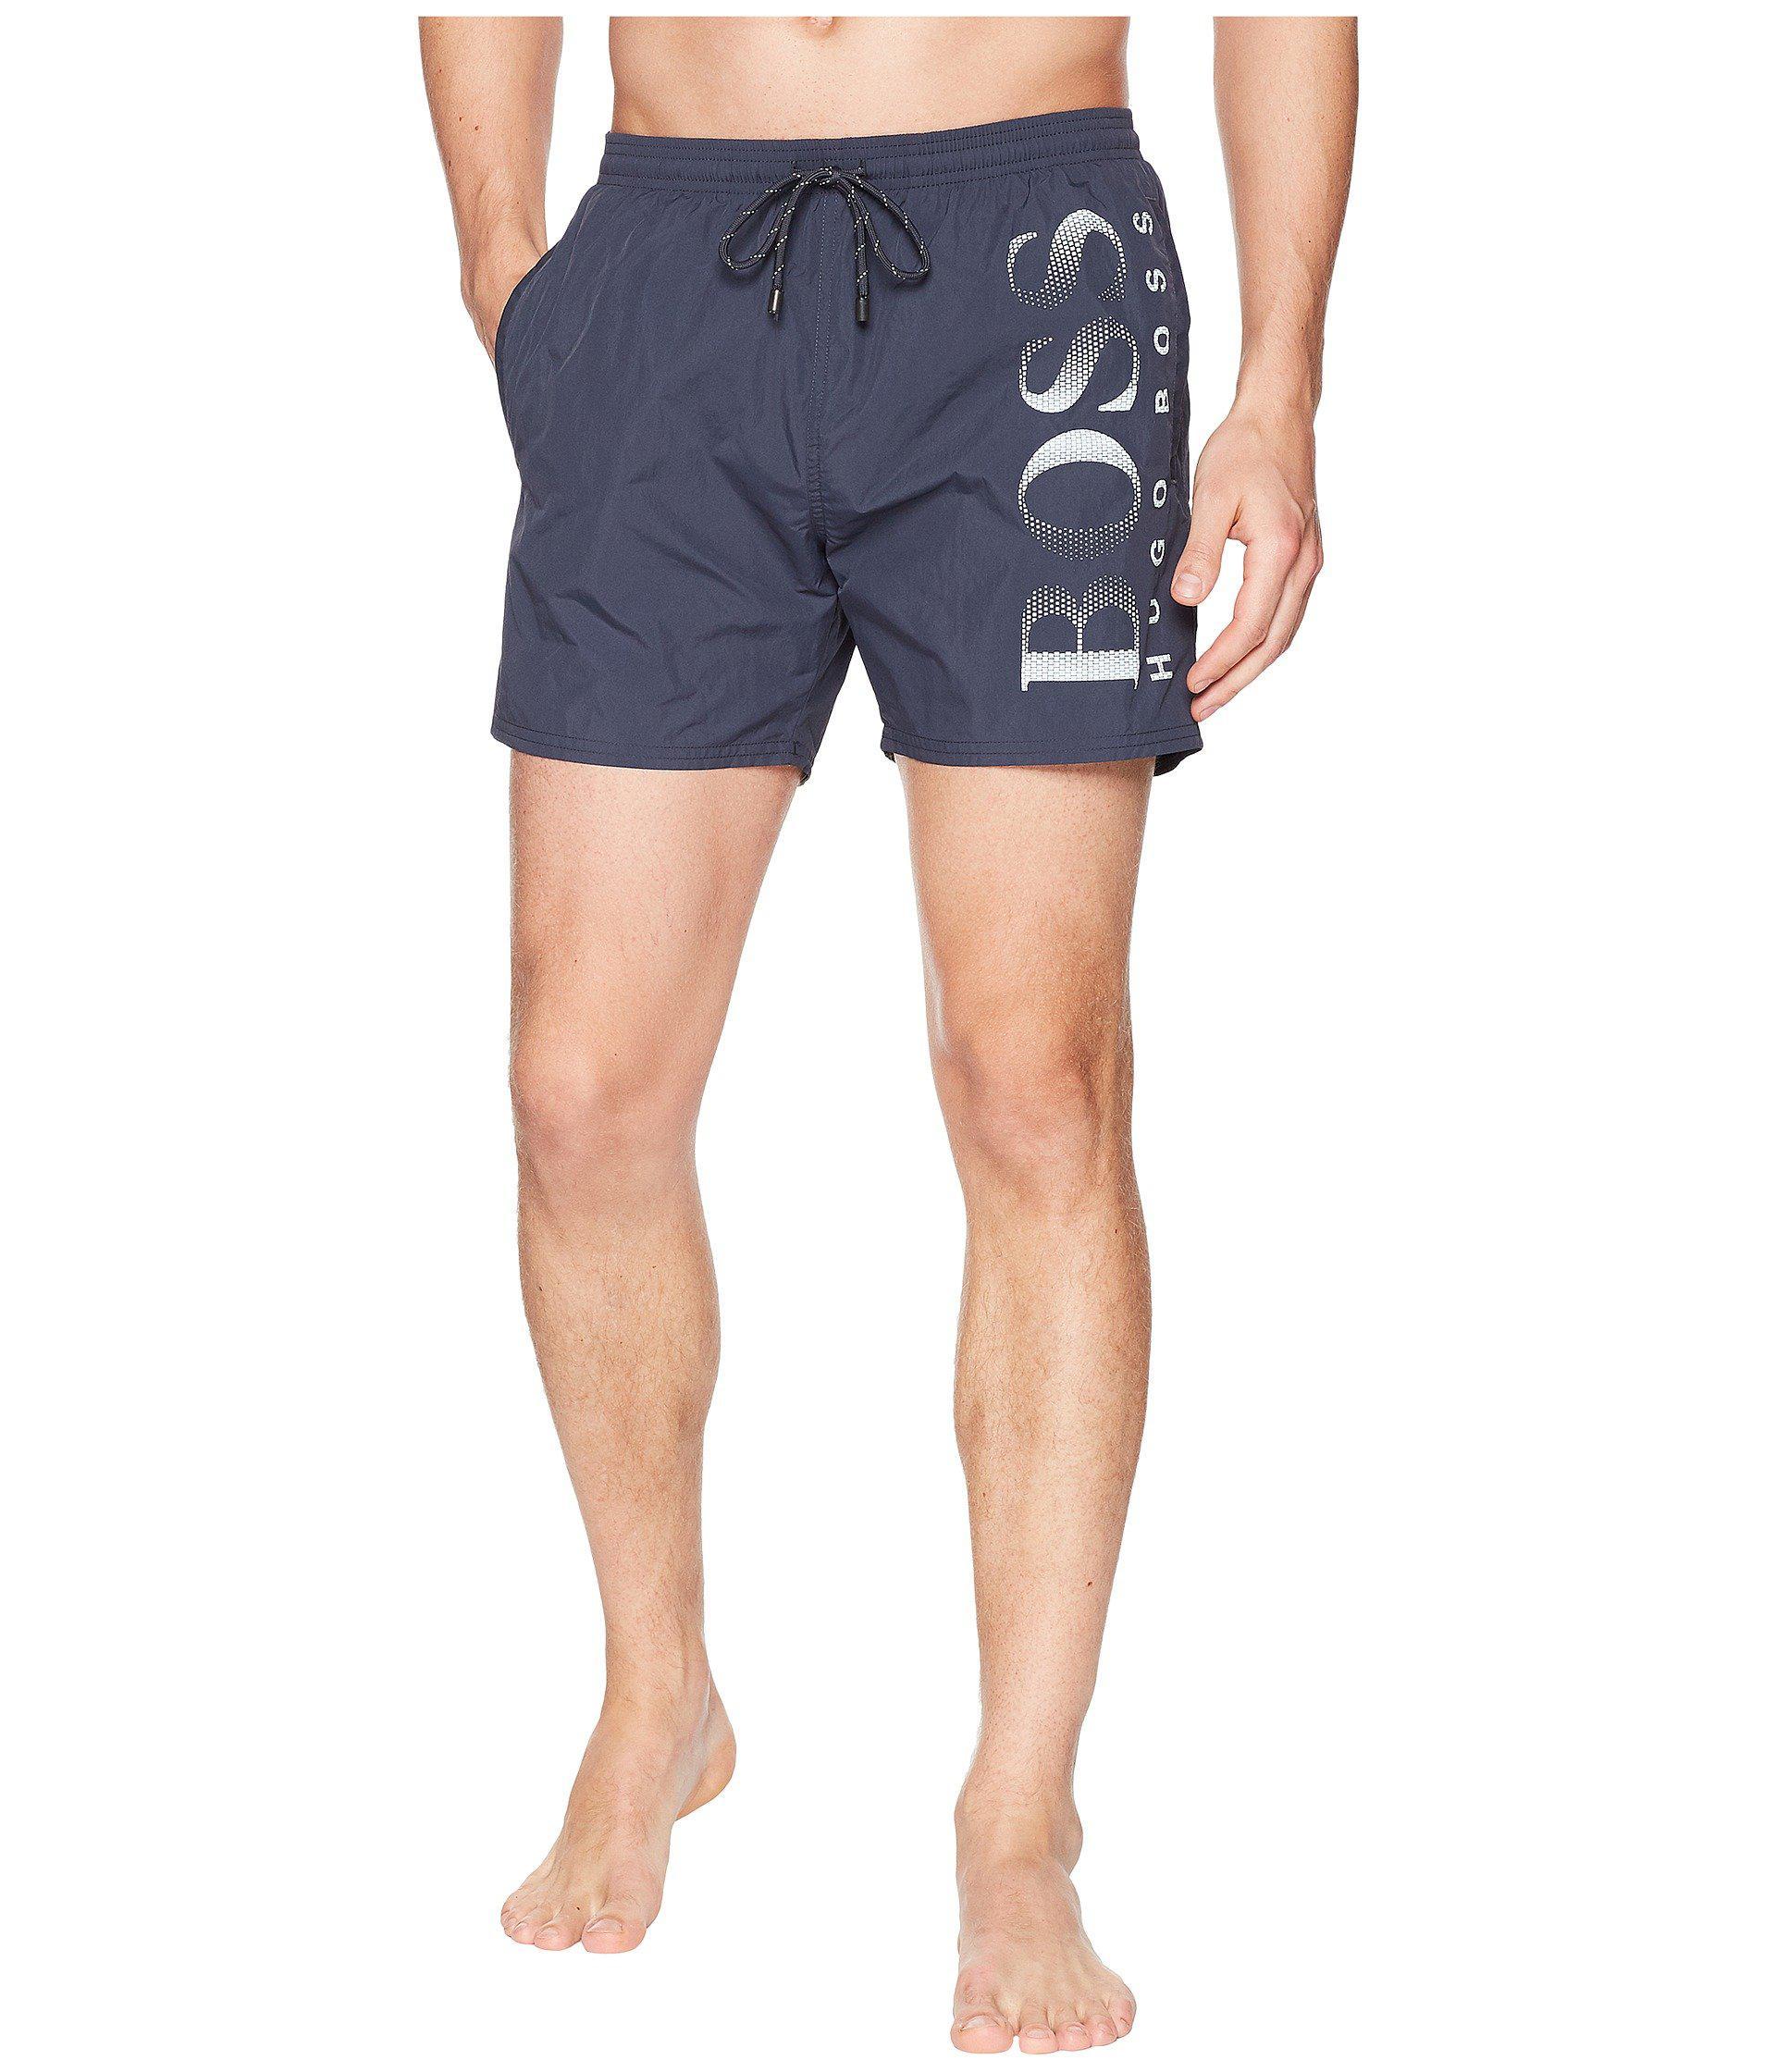 a989cc9650 Lyst - BOSS Octopus (light Past/red) Men's Swimwear in Gray for Men